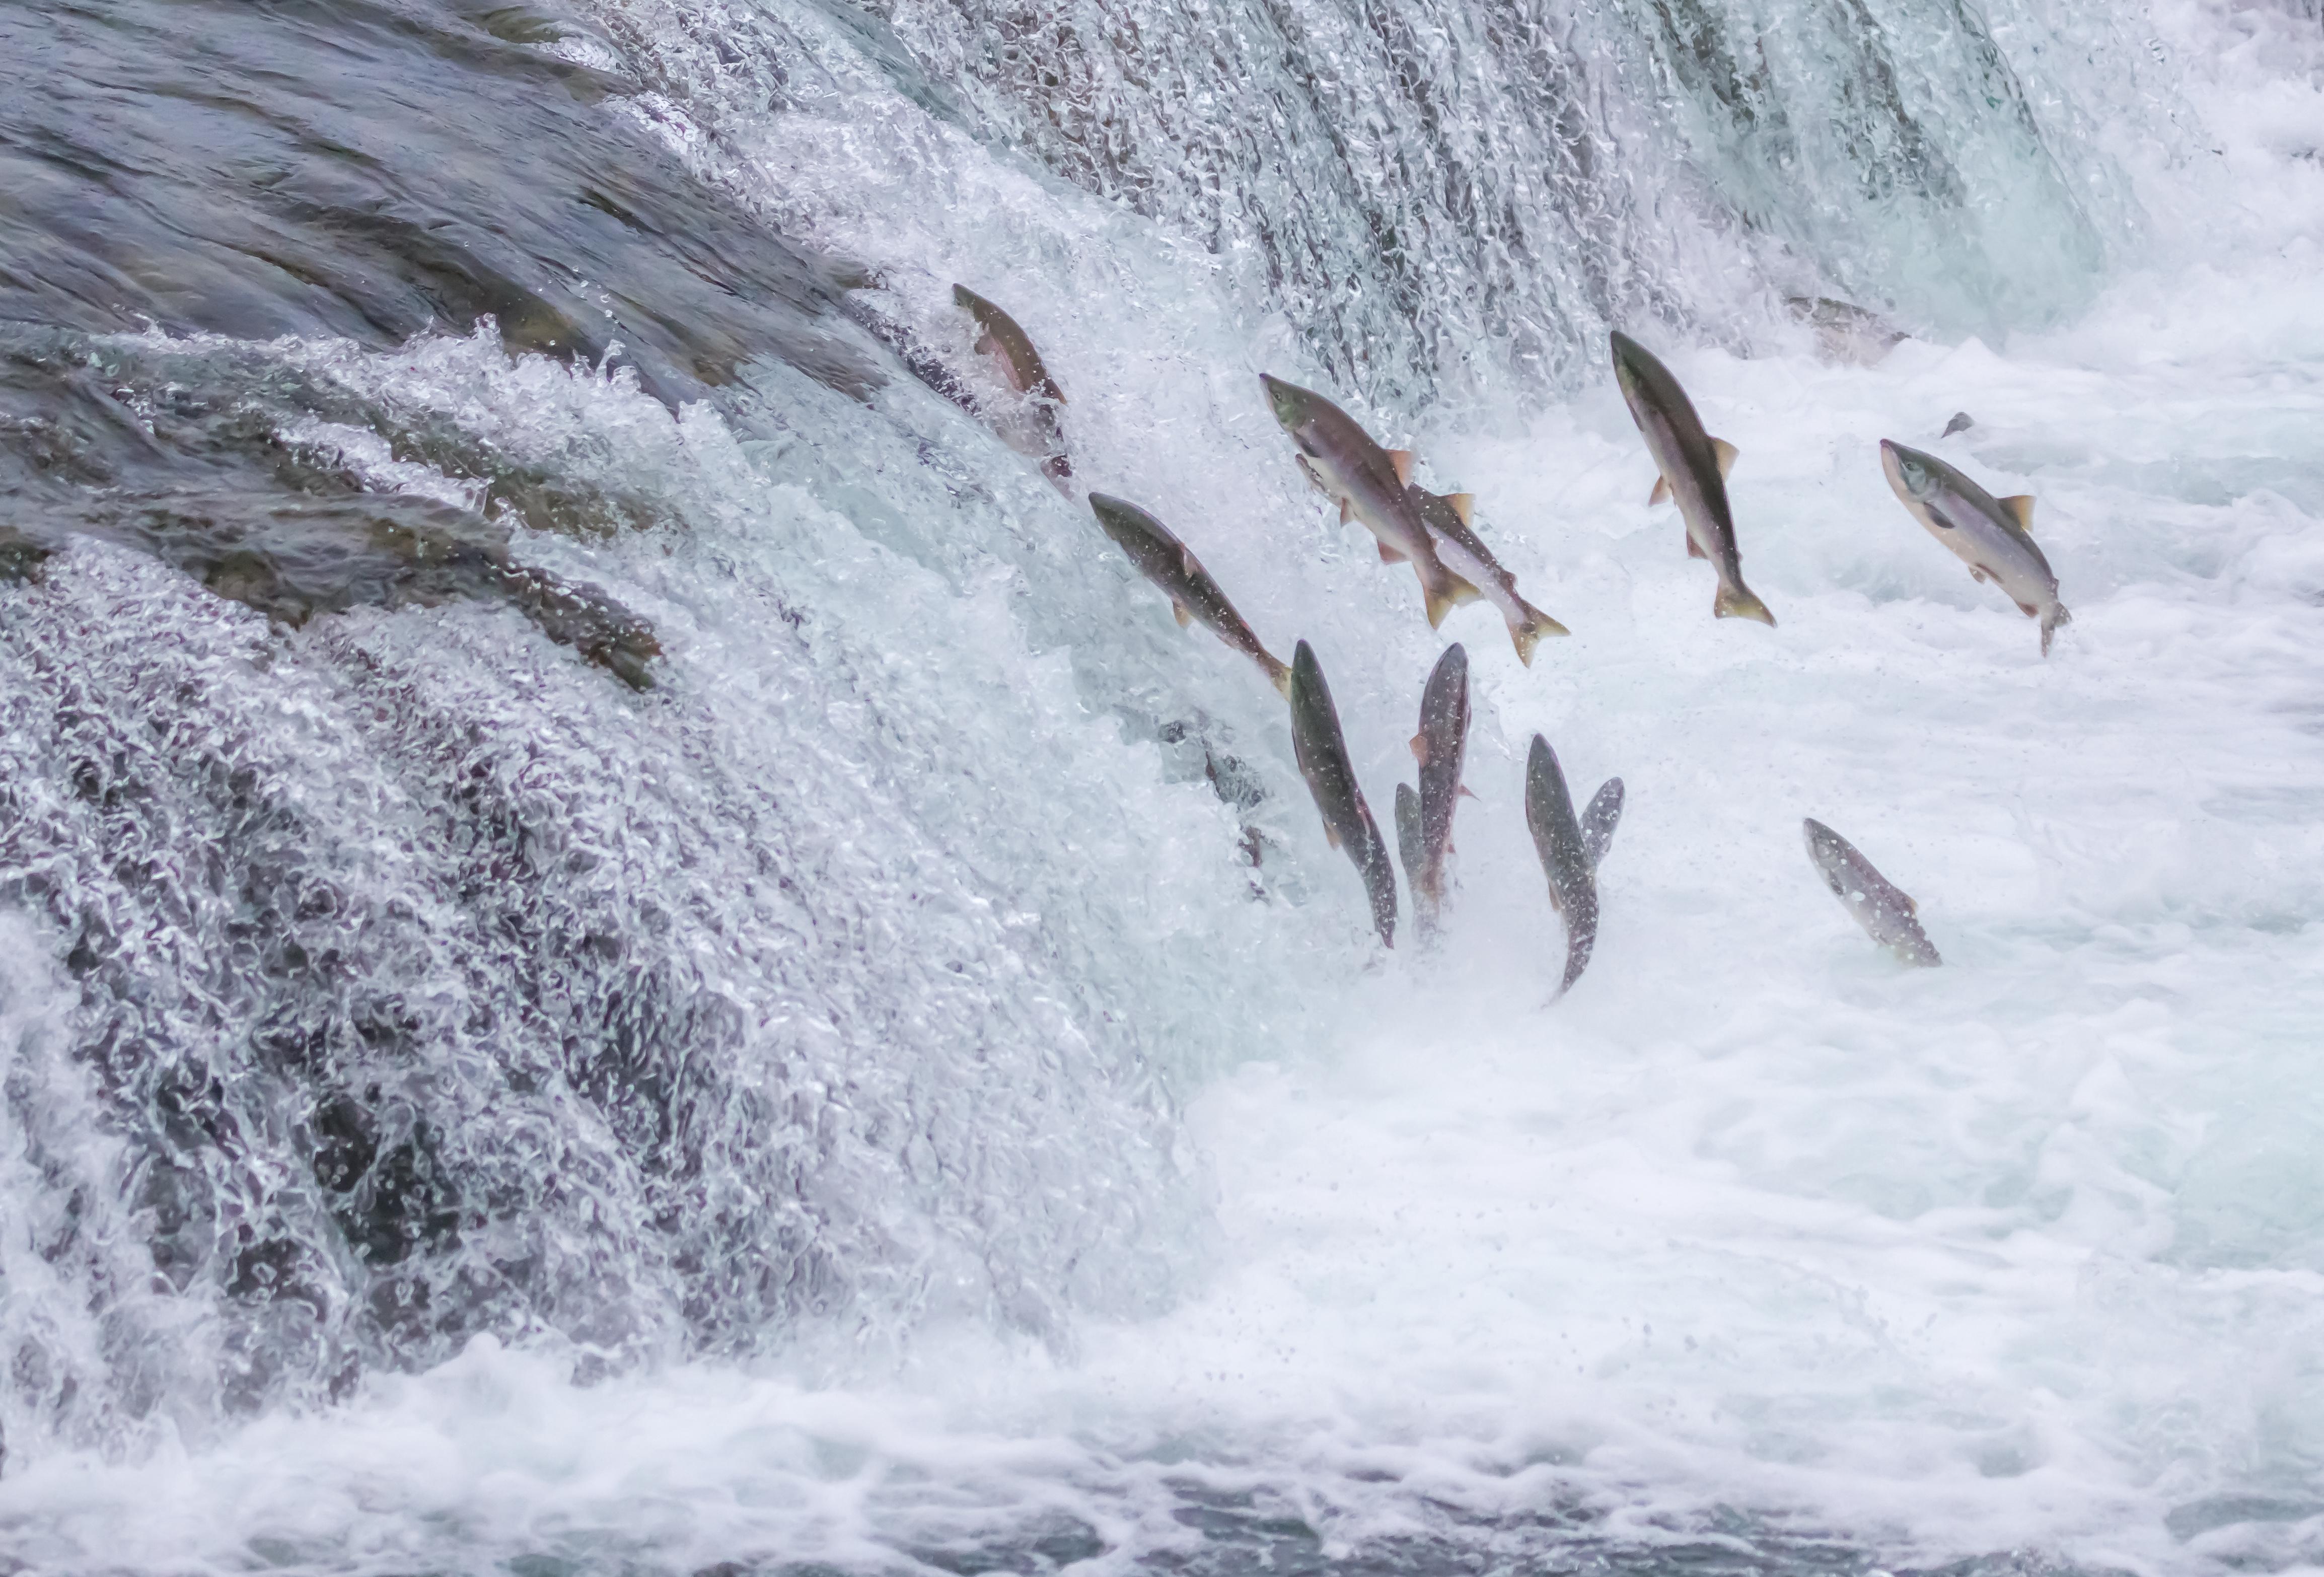 Pacific Salmon Jumping Up the Brooks Falls at Katmai National Park, Alaska (Original source: Shutterstock)